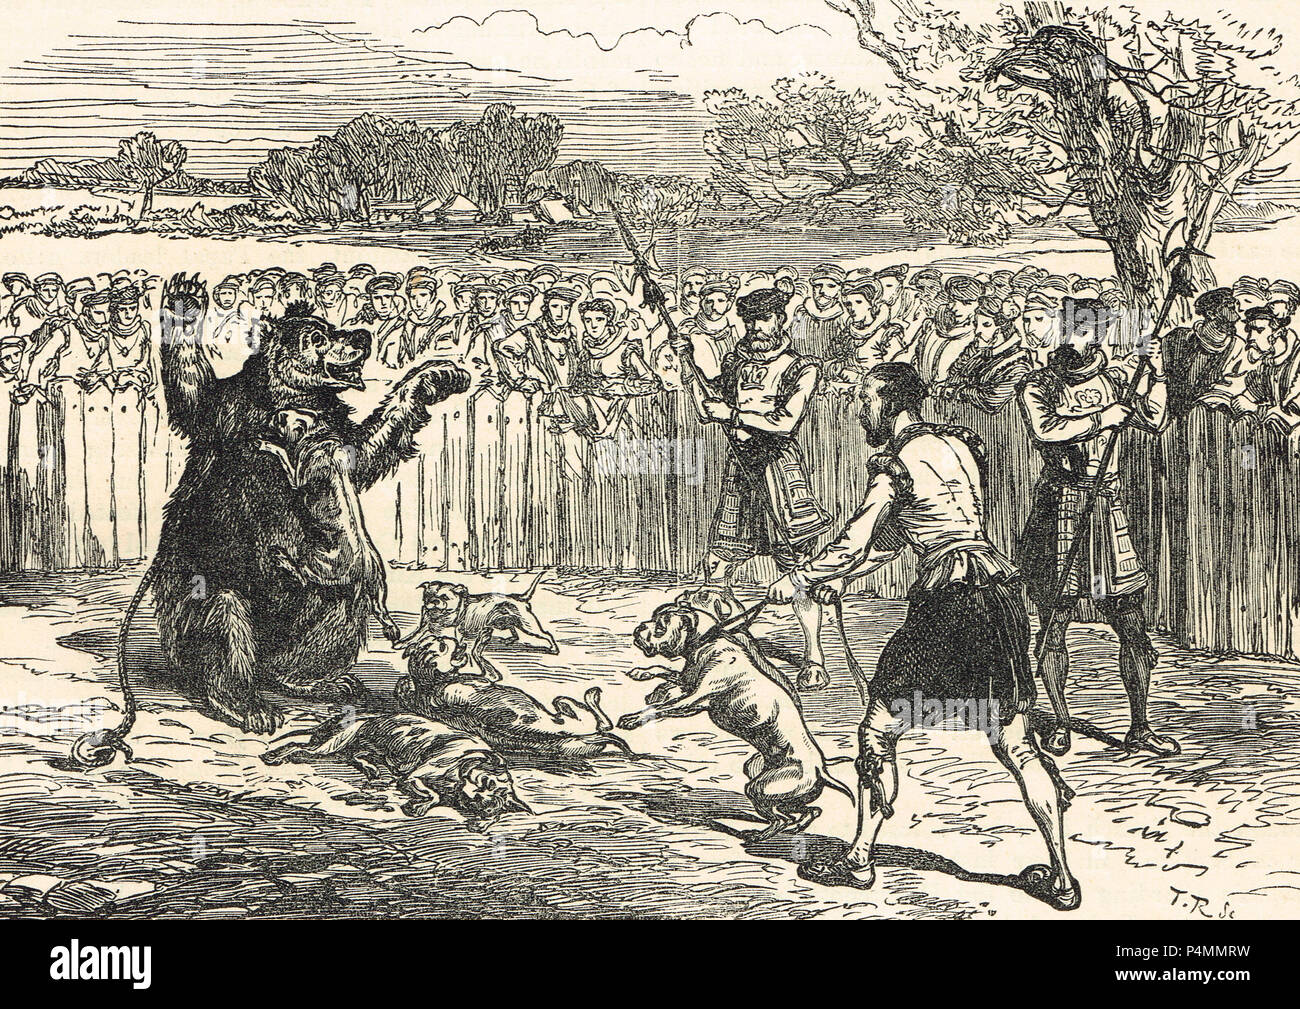 Bear baiting in the Elizabethan era - Stock Image